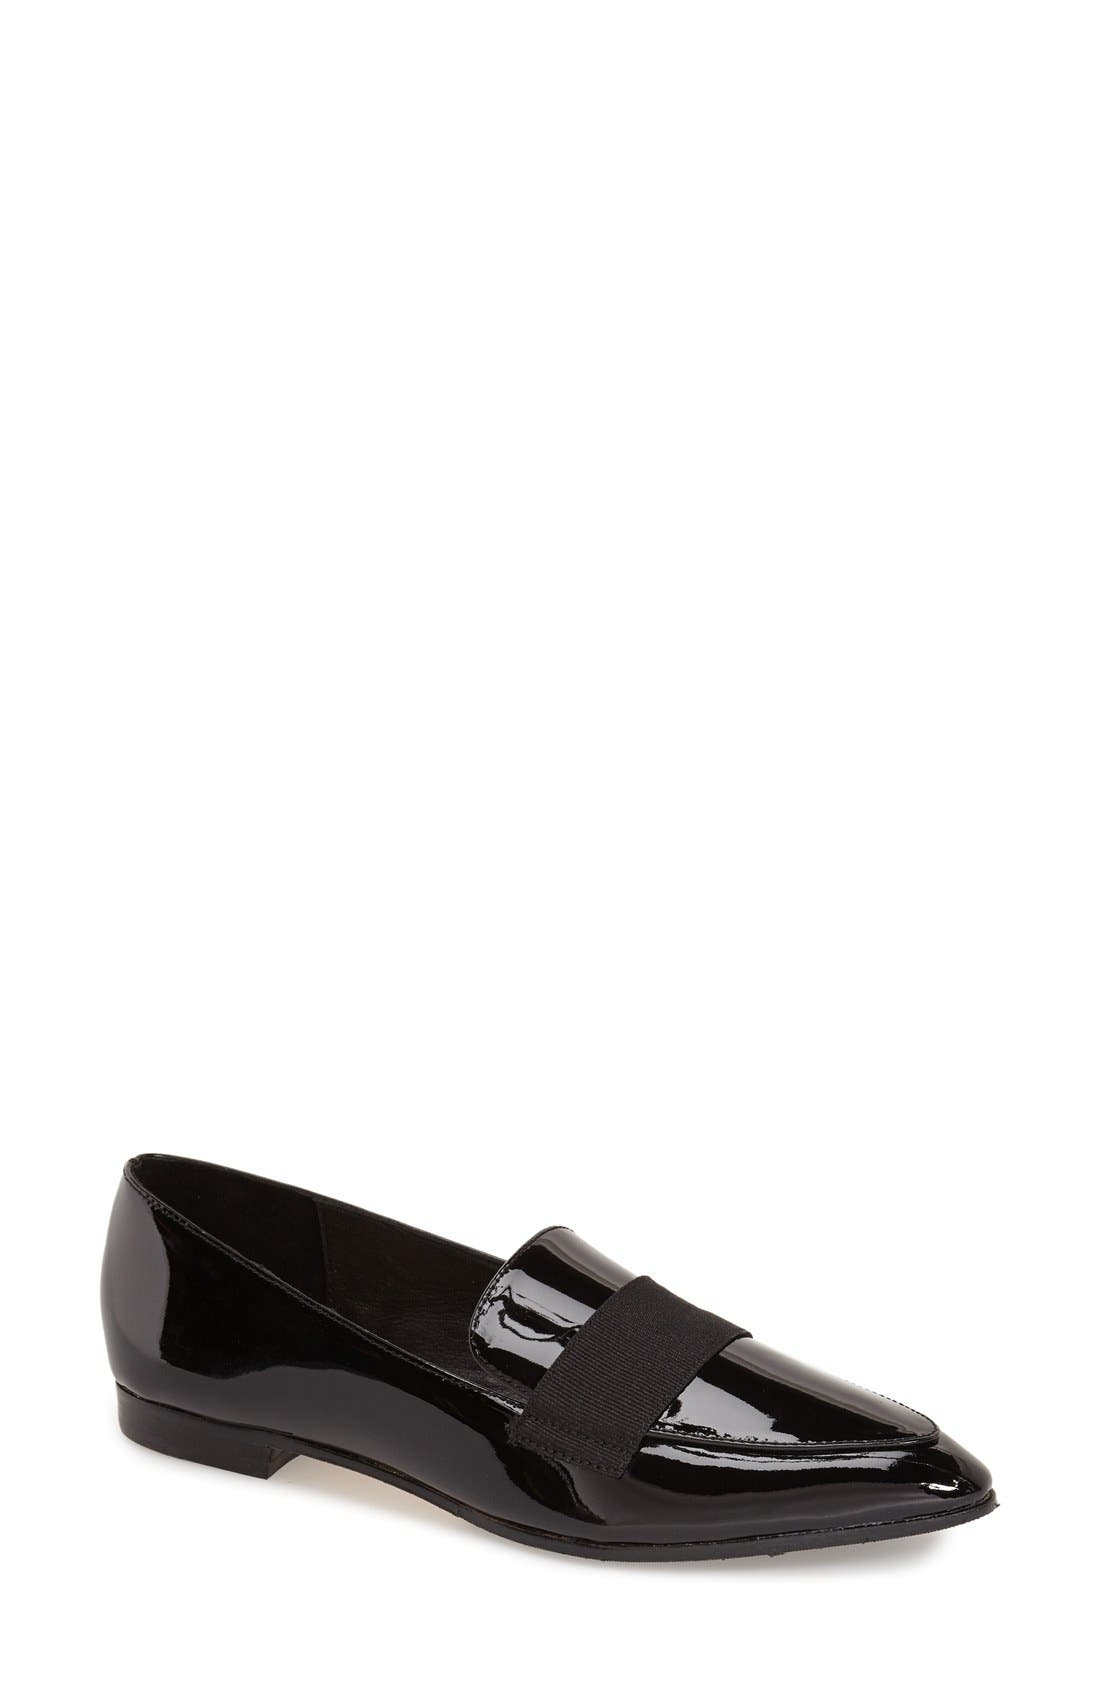 Alternate Image 1 Selected - kate spade new york 'corina' pointy toe loafer (Women)